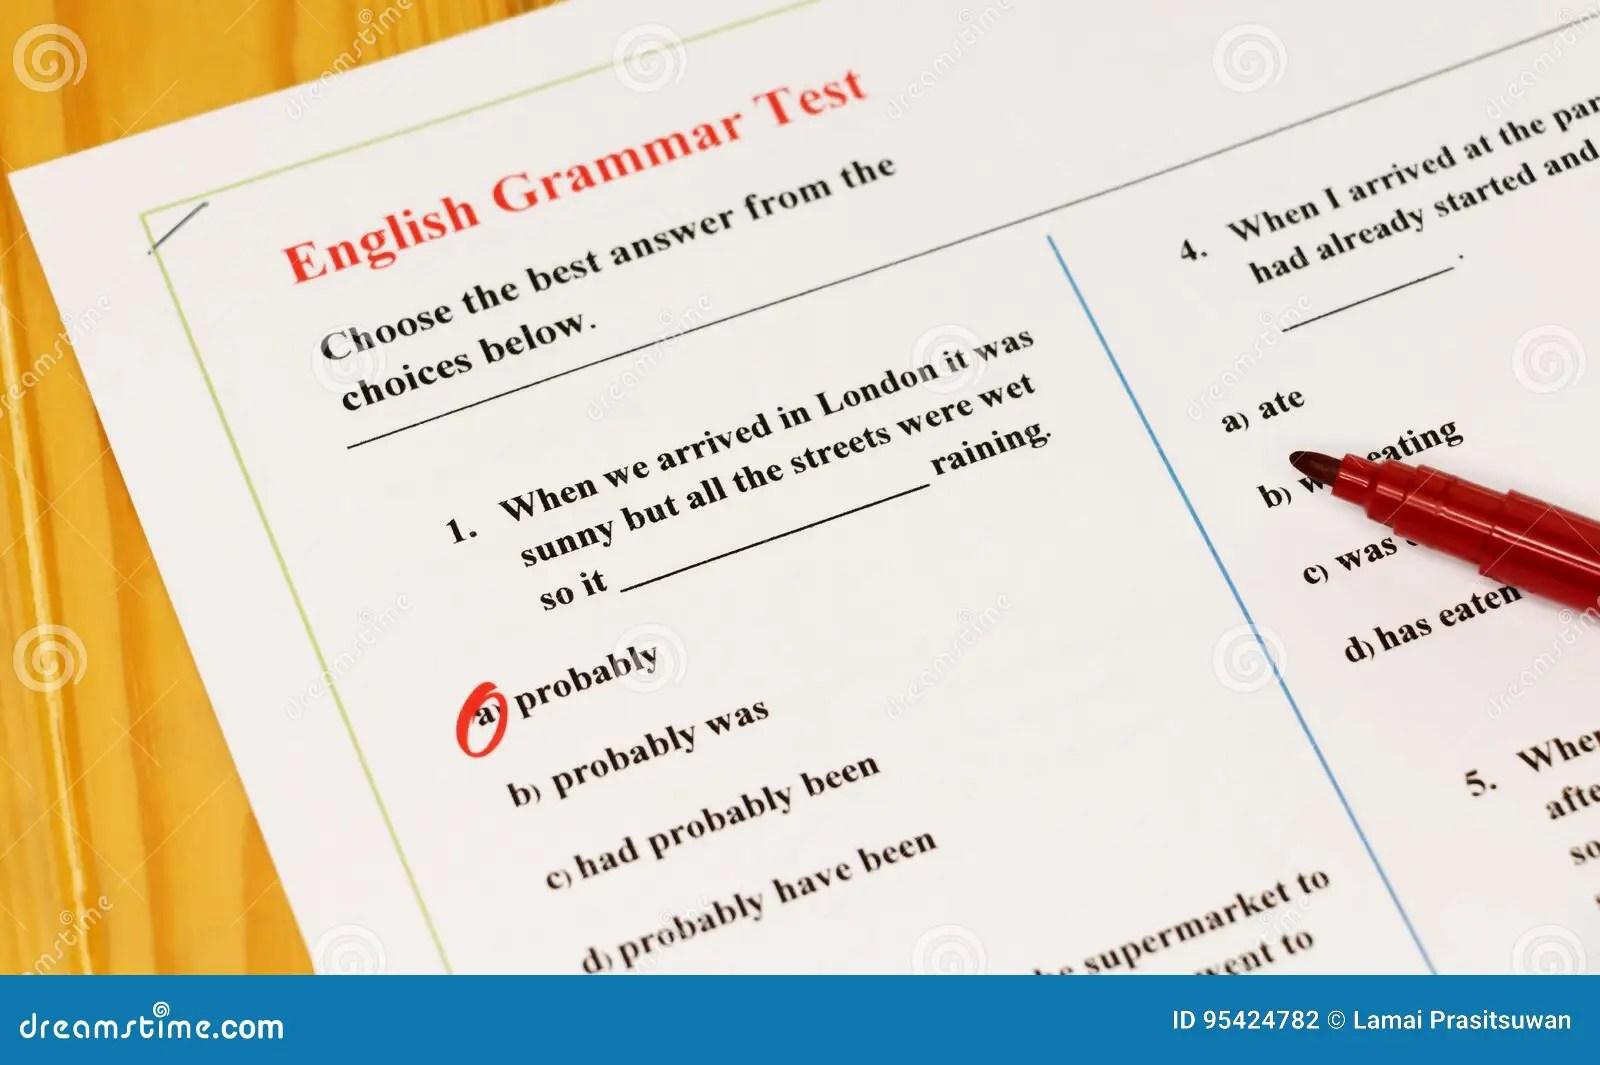 Was Started Grammar Grammar Worksheets For Kids 02 18